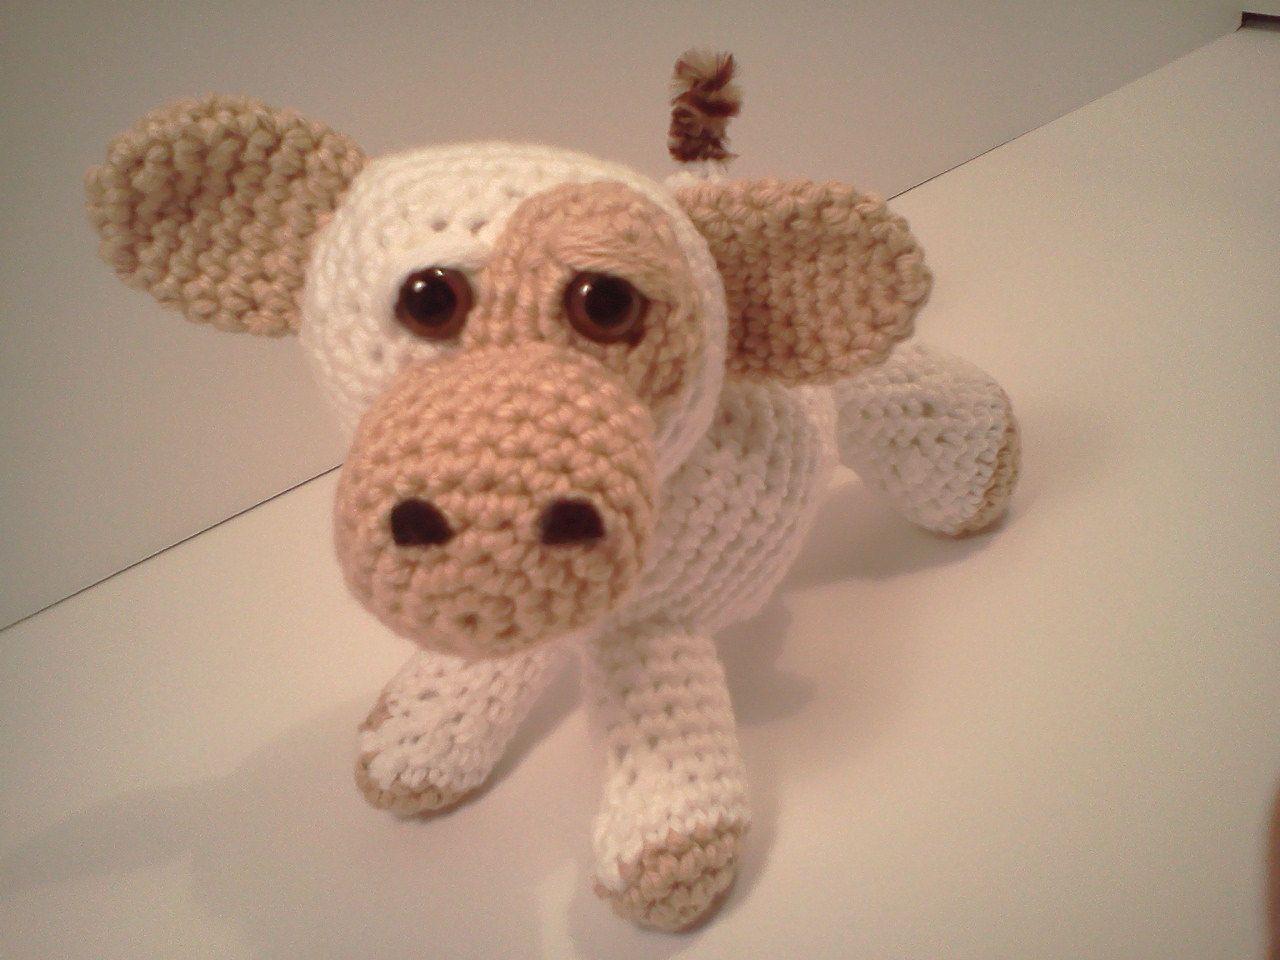 Amigurumi Patterns Free Crochet Pdf : Emma baby cow free amigurumi pattern here: http: marywalkerartist